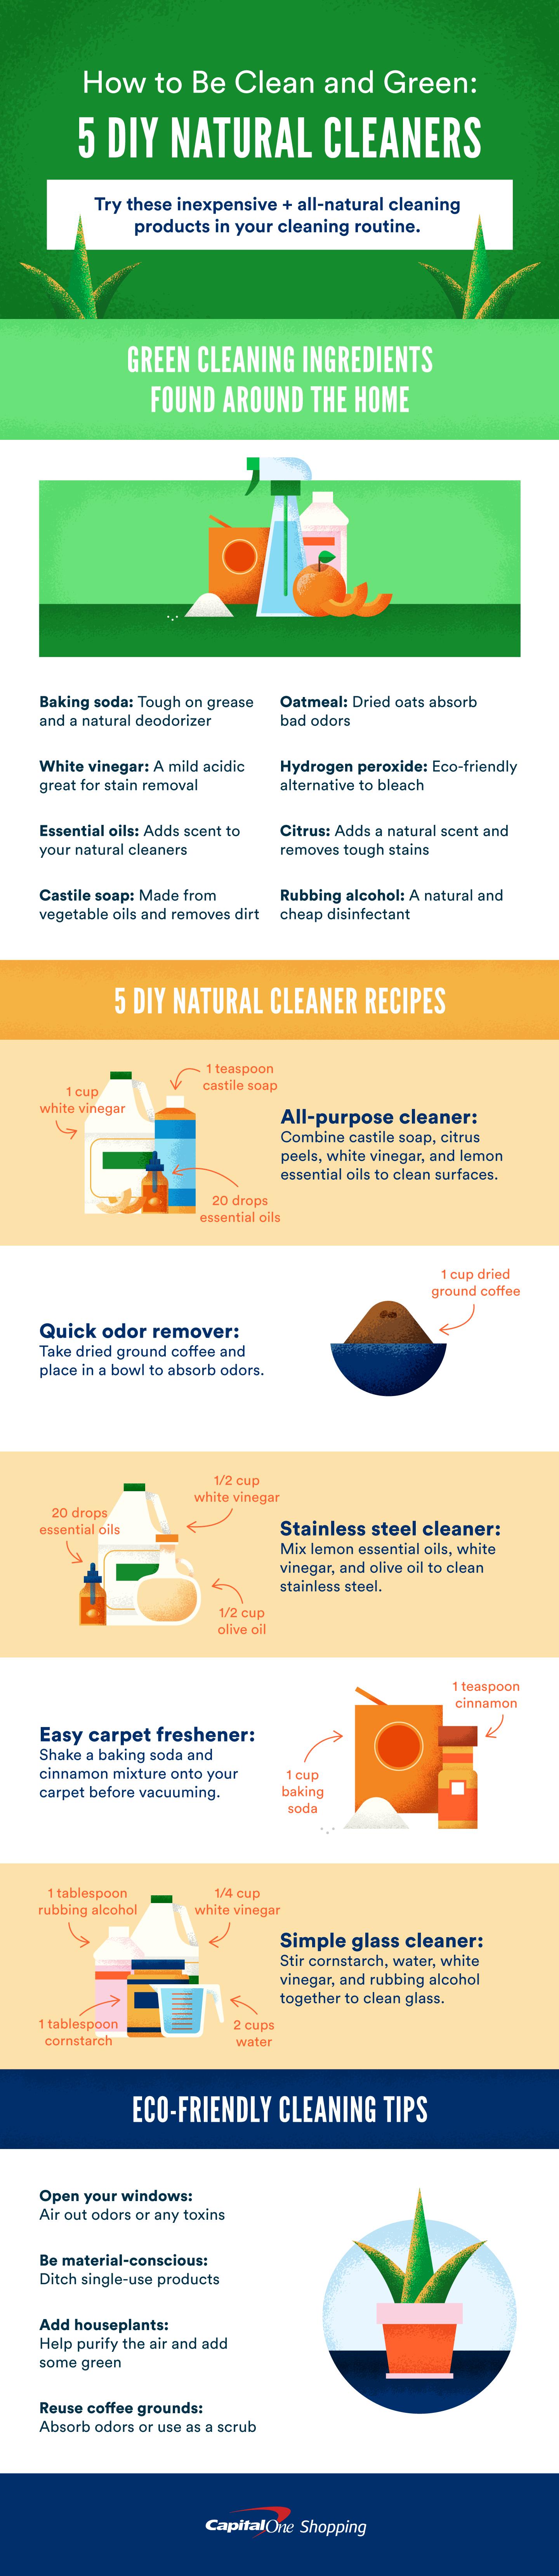 5 DIY Natural Cleaners [Visual]   ecogreenlove